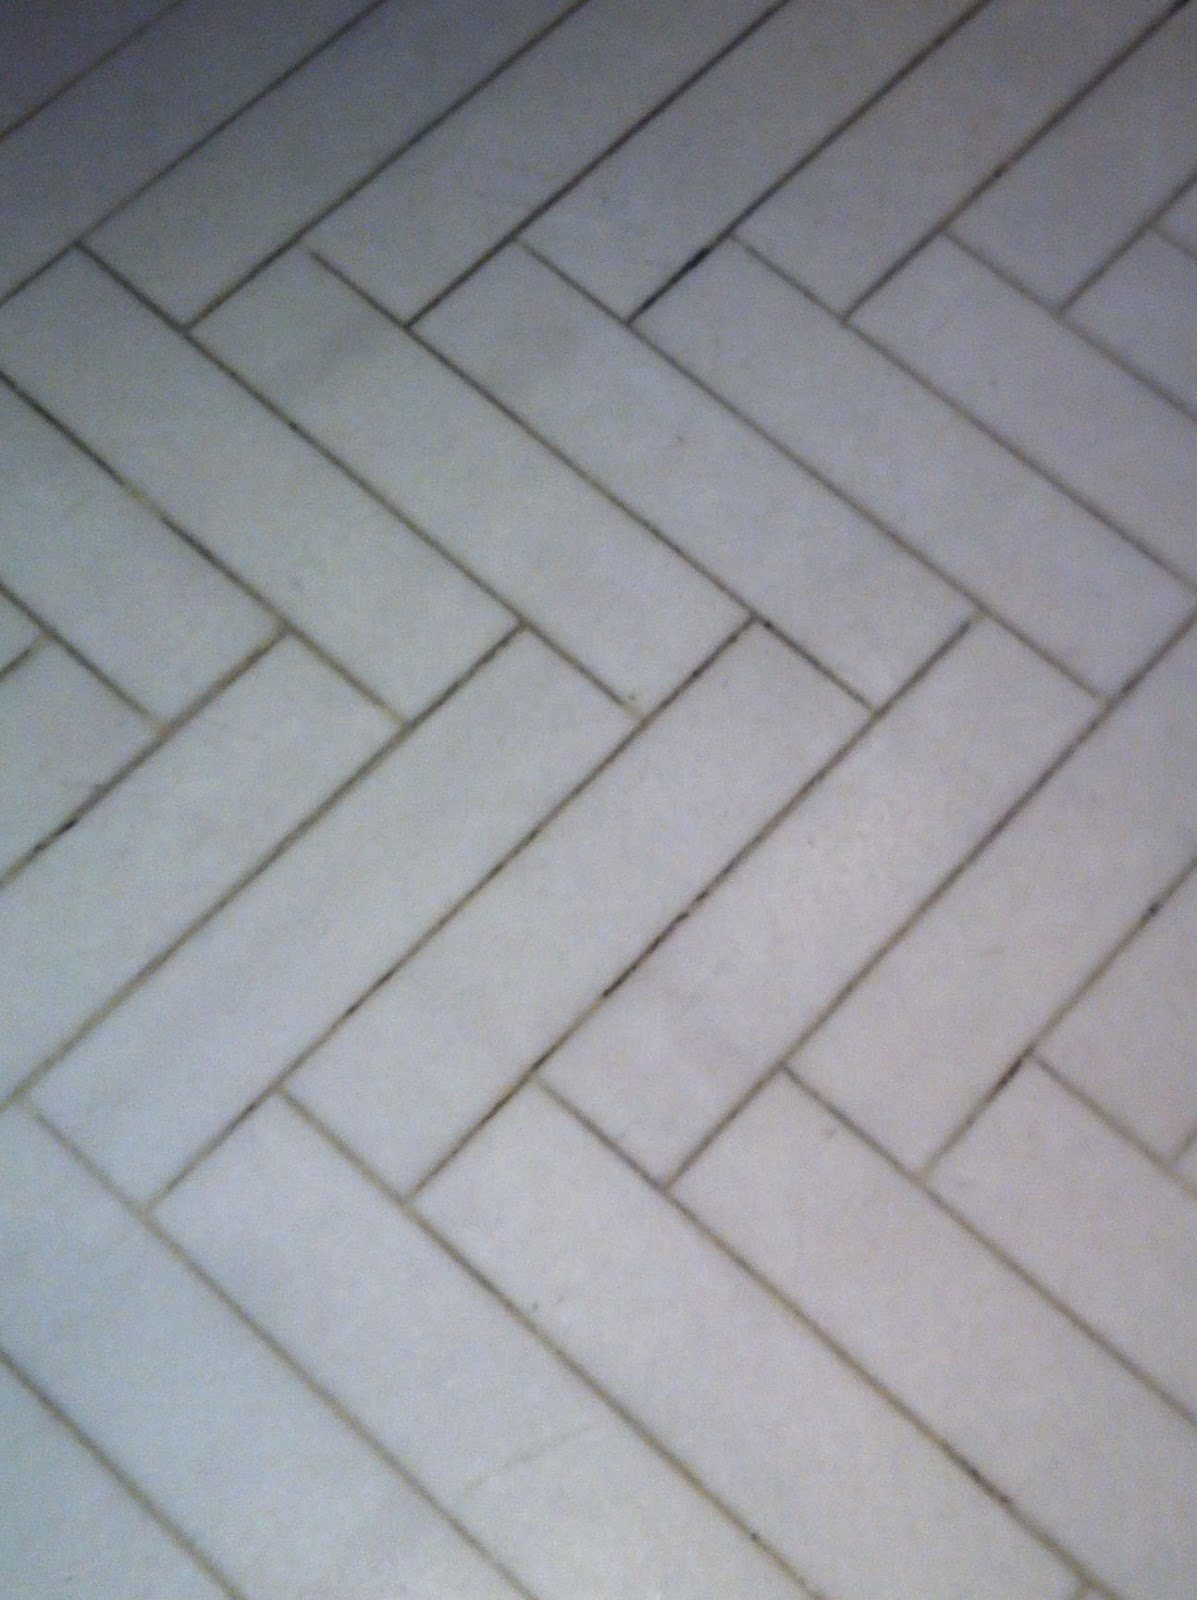 Herringbone Pattern Tile Floor | Tile Design Ideas